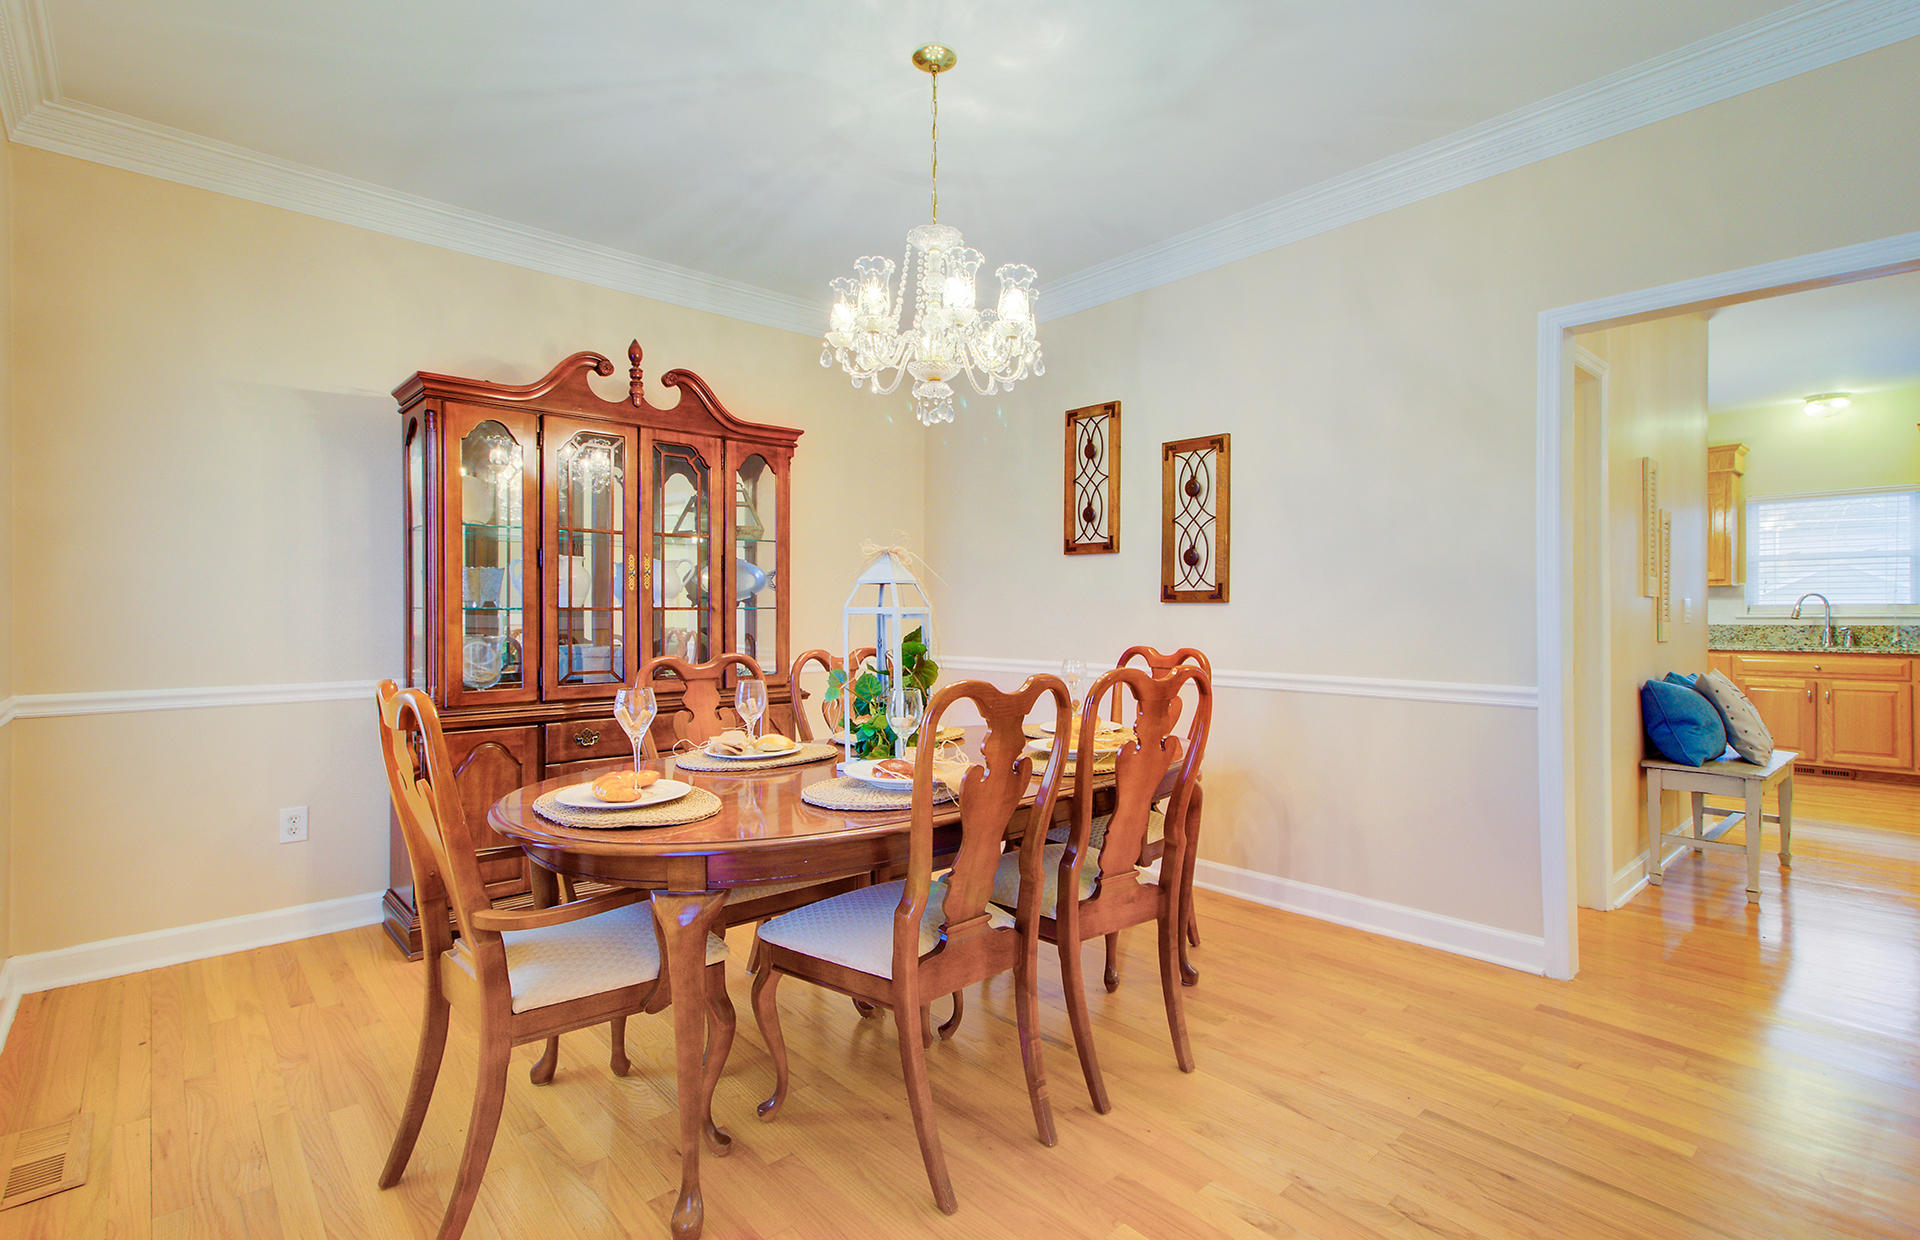 Bakers Landing Homes For Sale - 105 River Oak, North Charleston, SC - 23